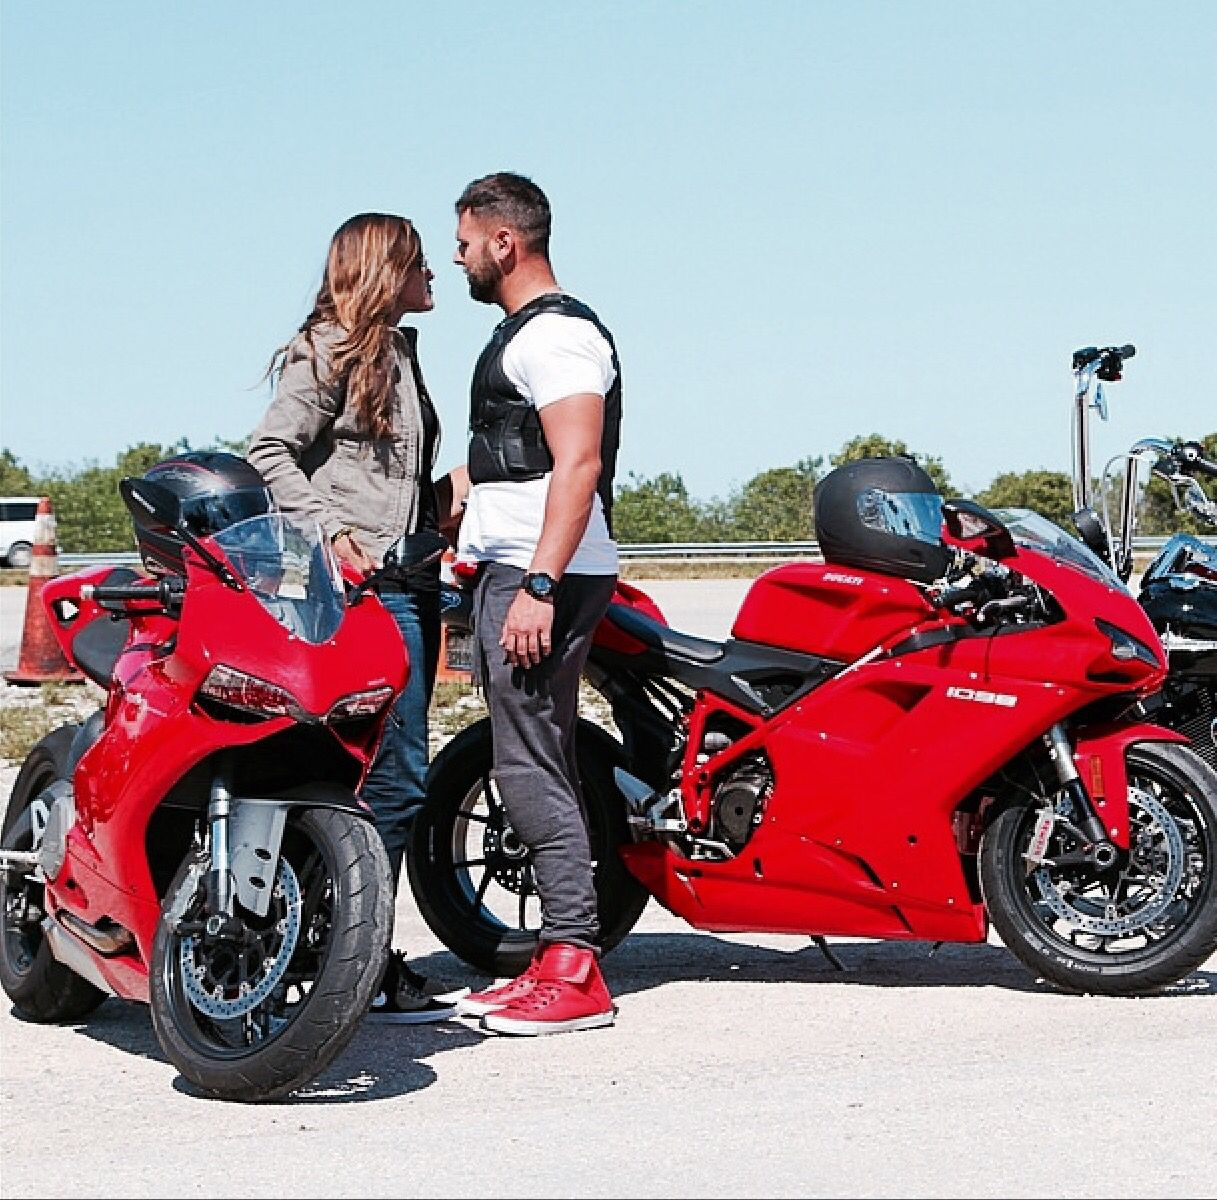 Ducati 899 Panigale Vs Ducati 1098 Motorcycle Culture Racing